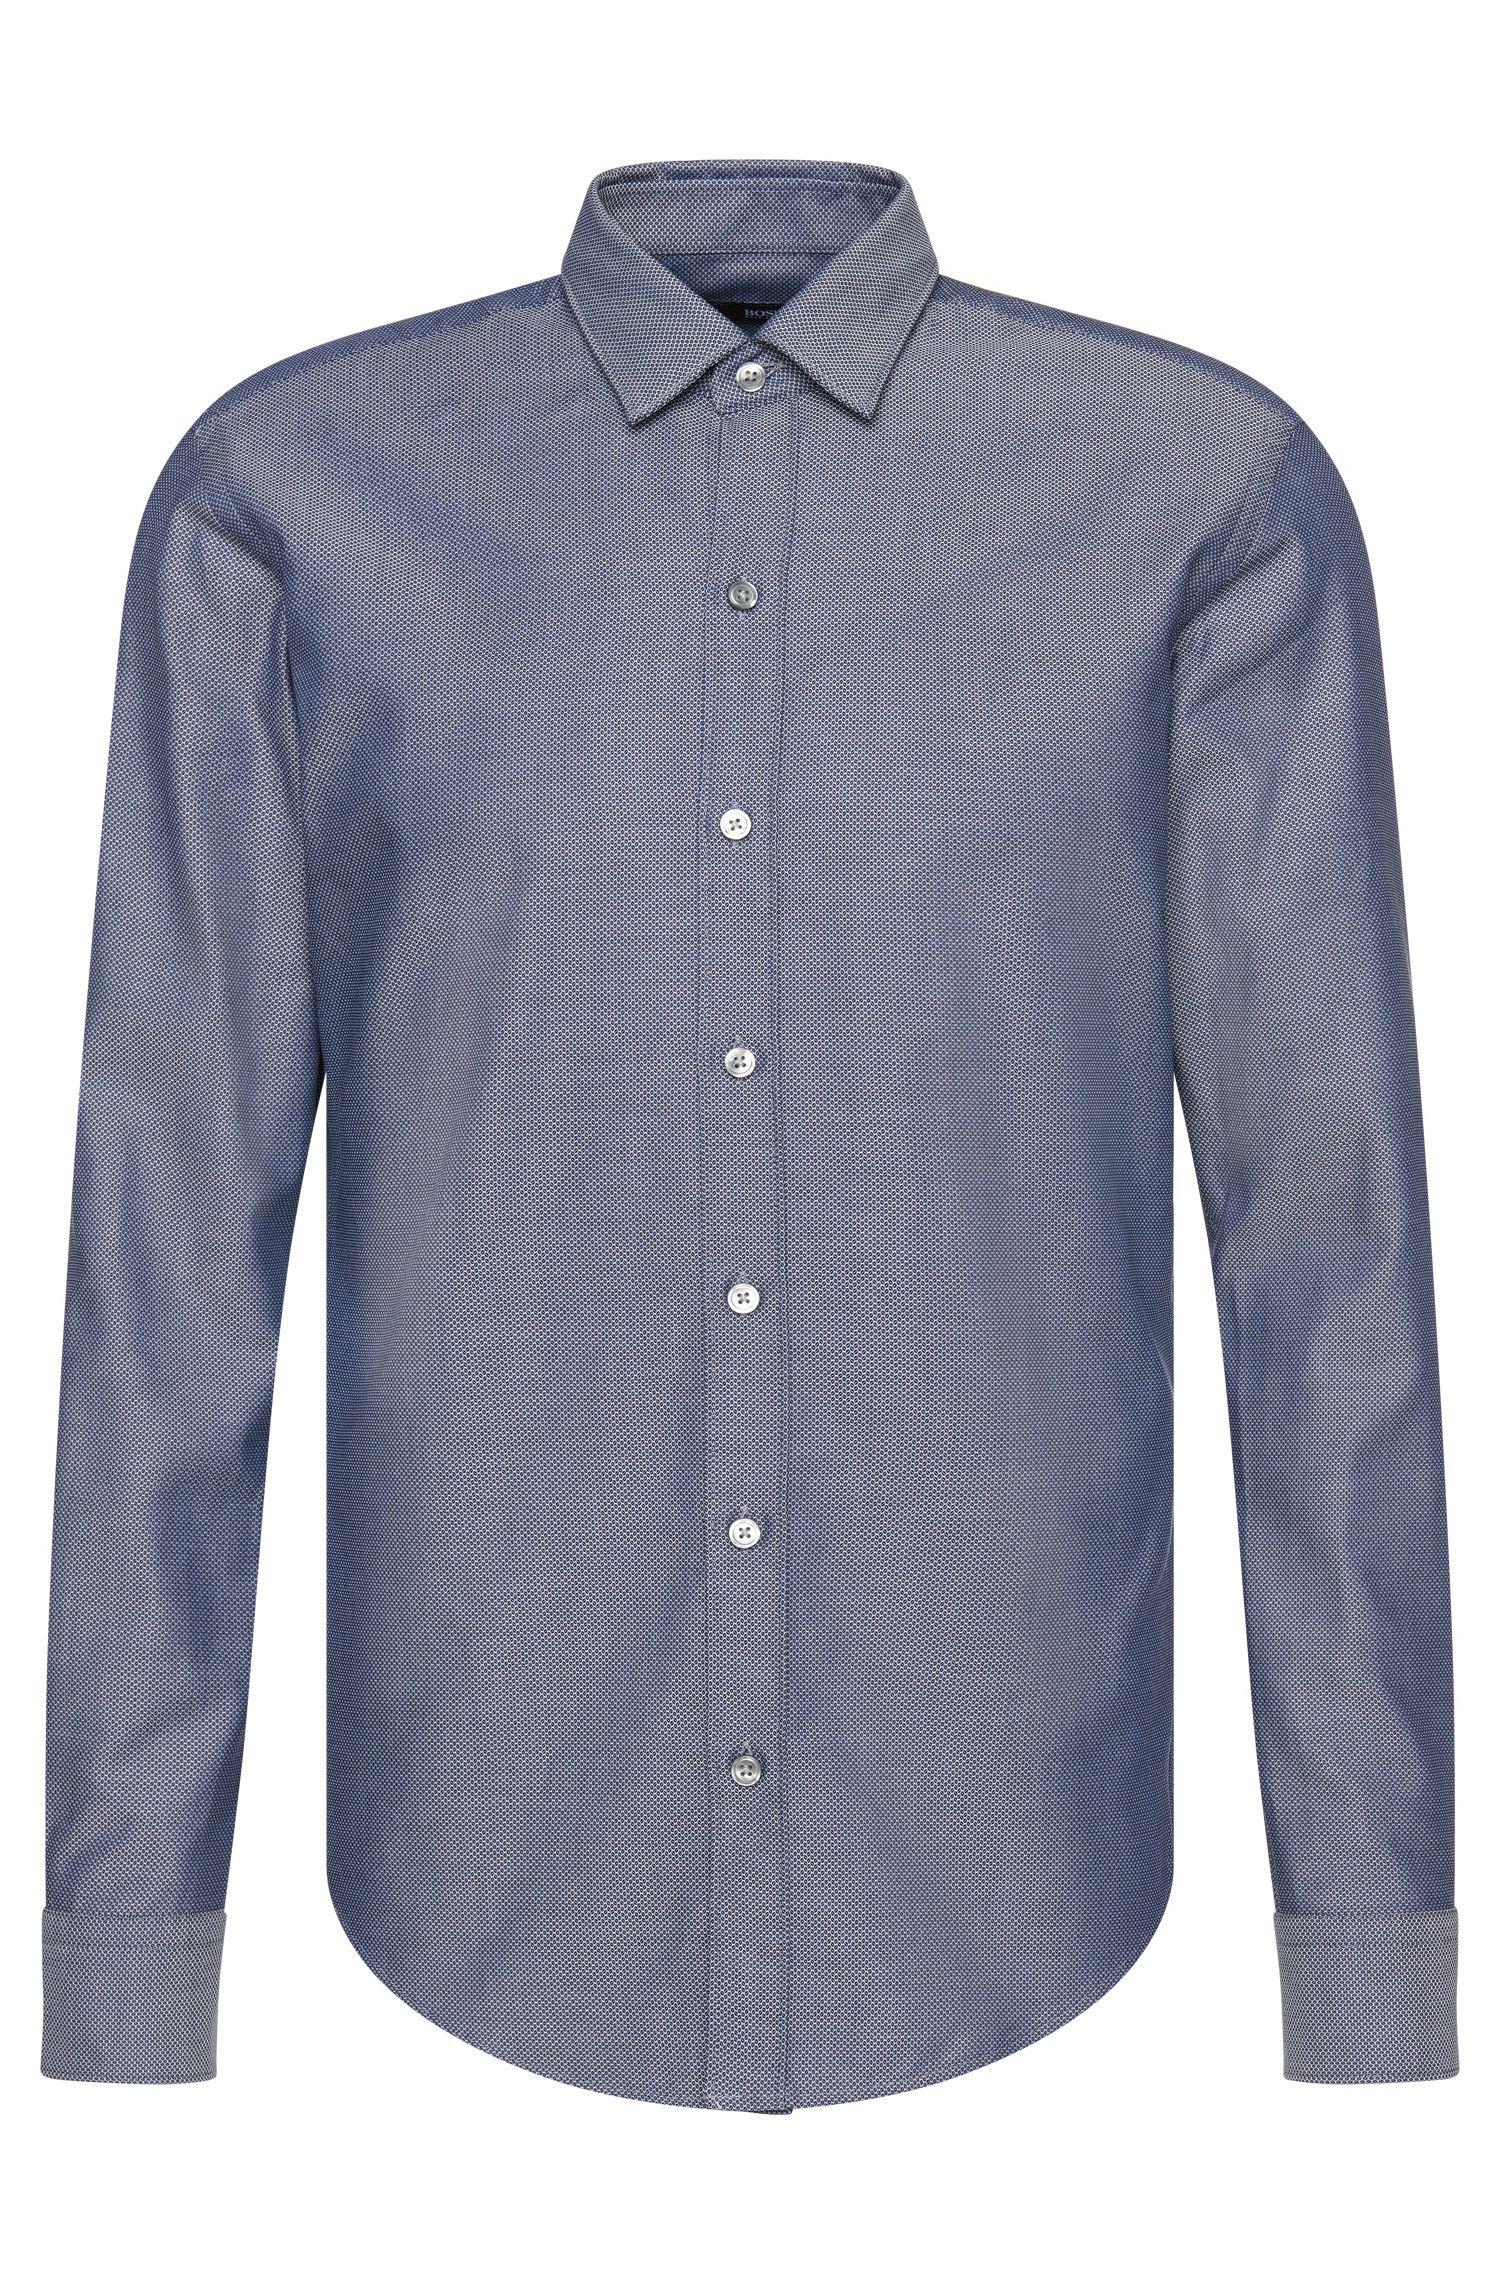 'Robbie' | Slim Fit, Cotton Button Down Shirt